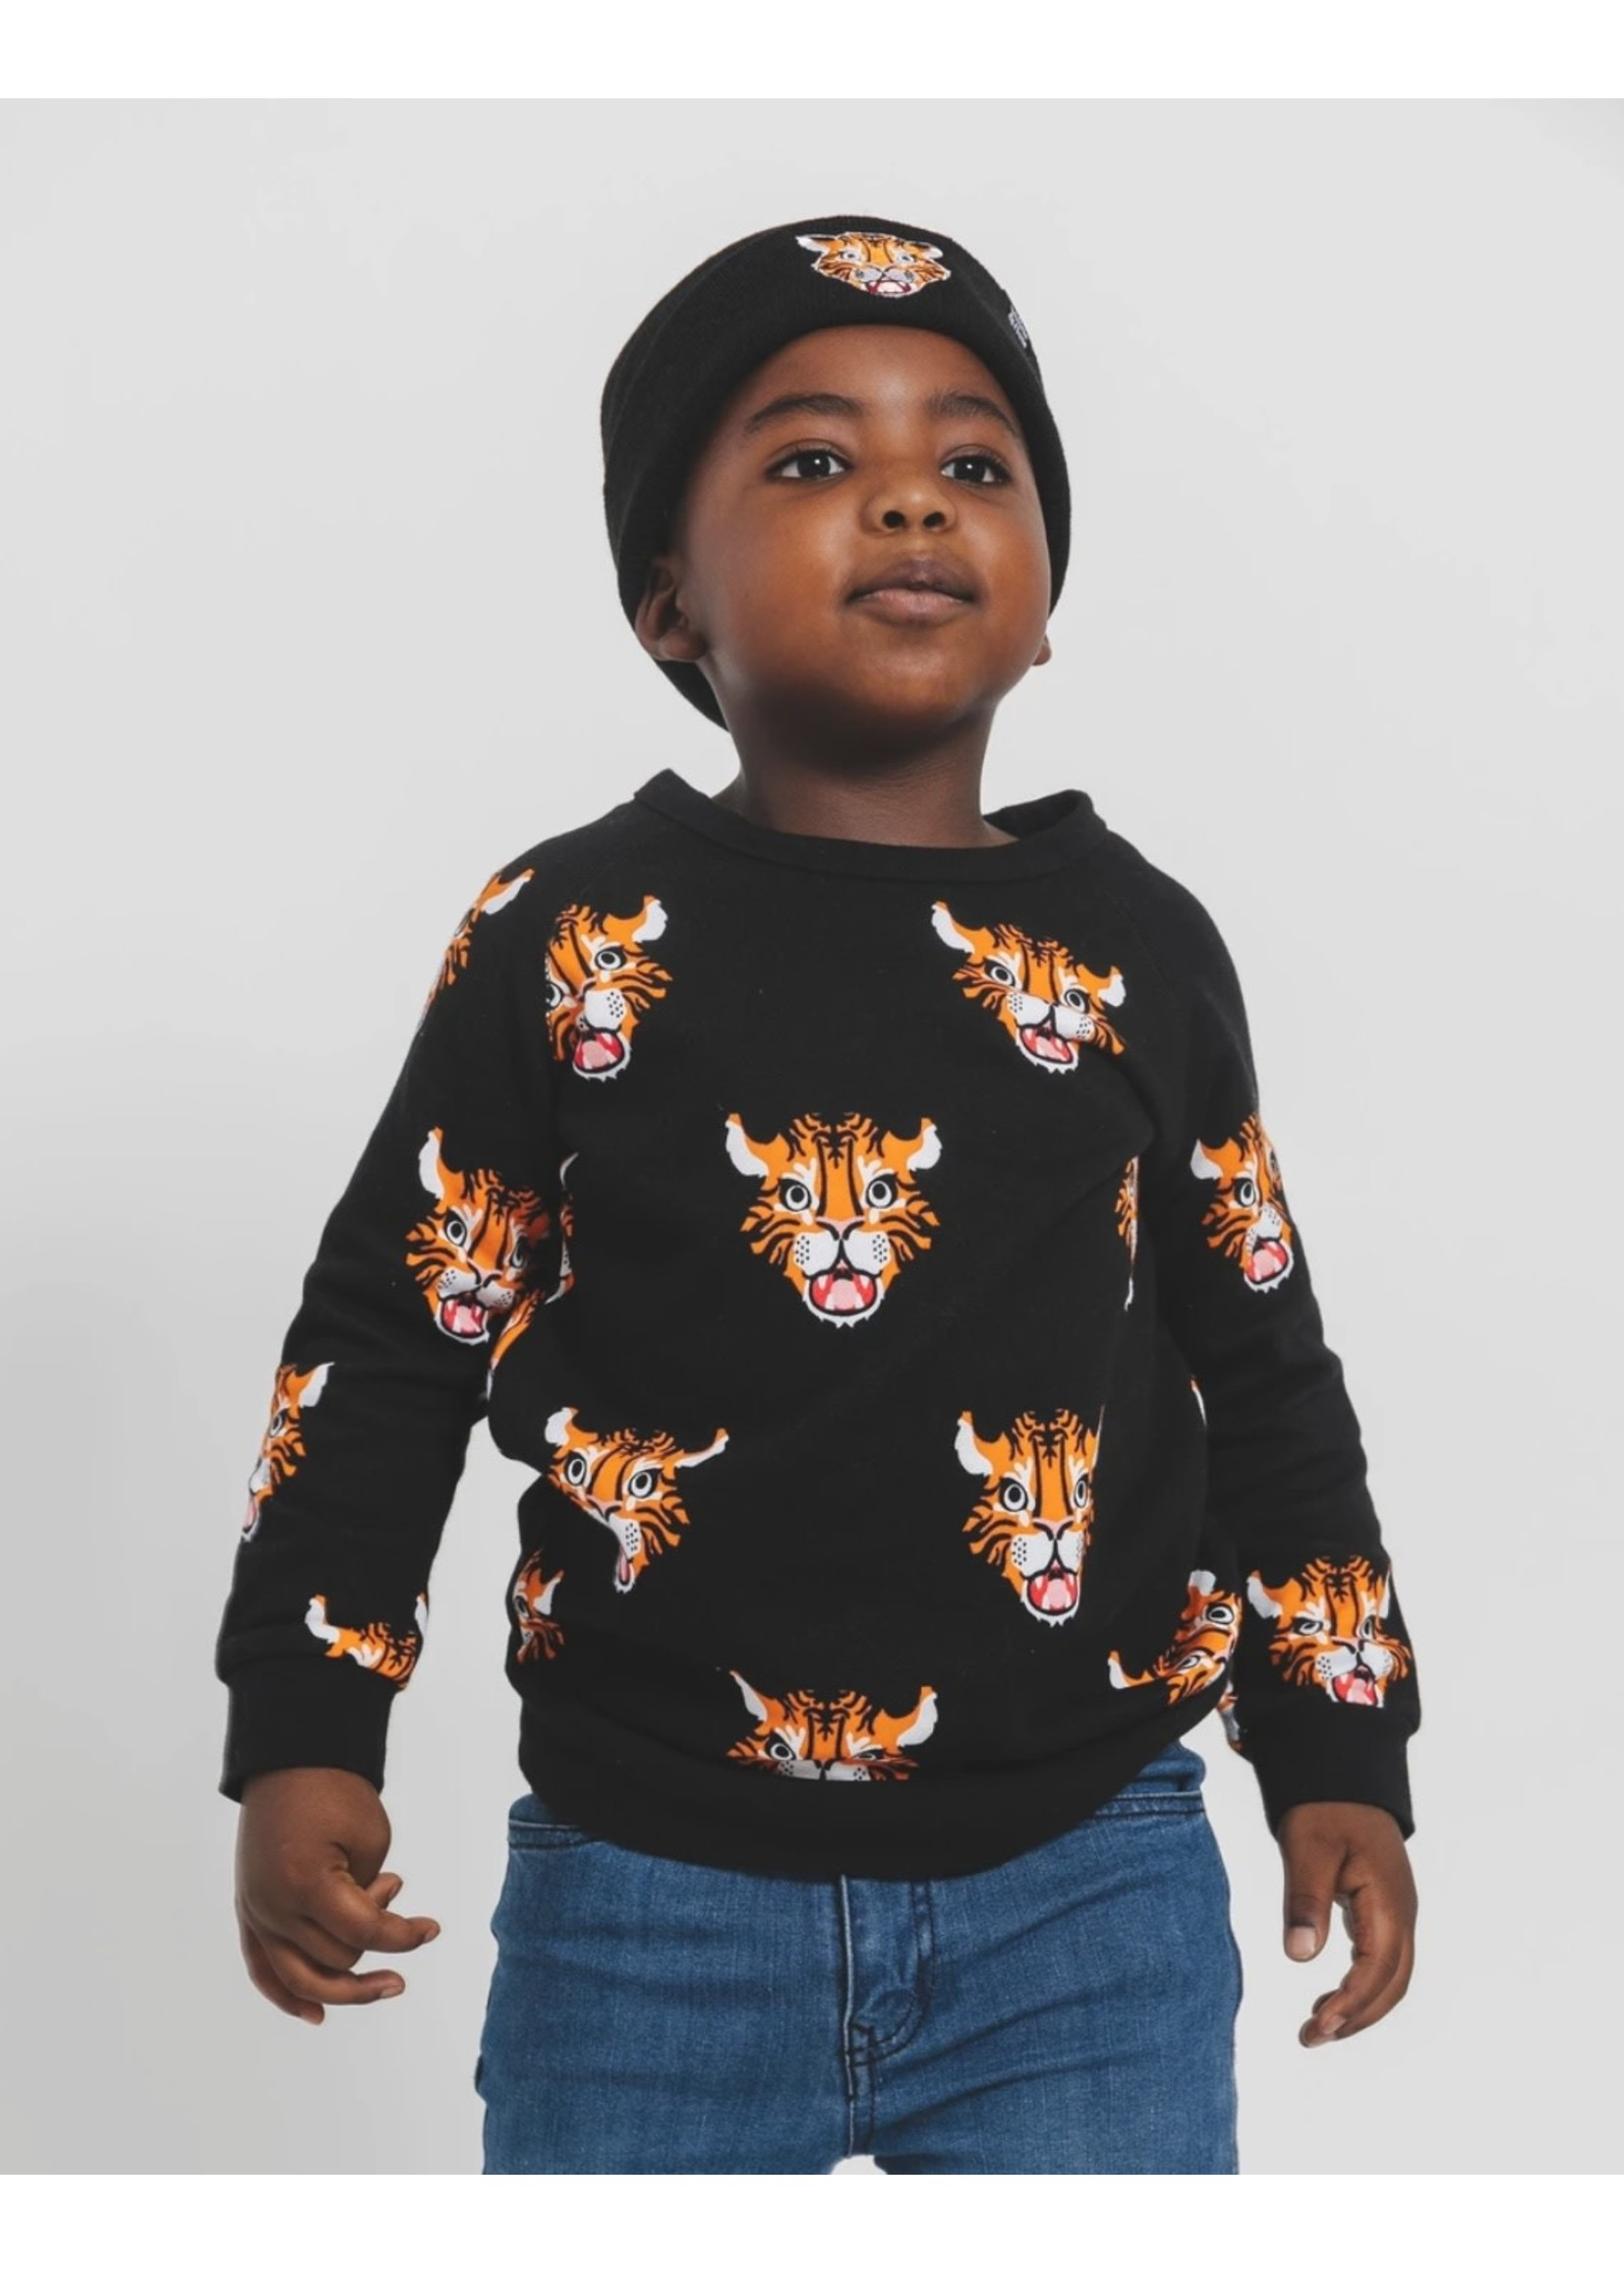 Whistle & Flute Whistle & Flute, Tiger Allover Print Black Sweatshirt